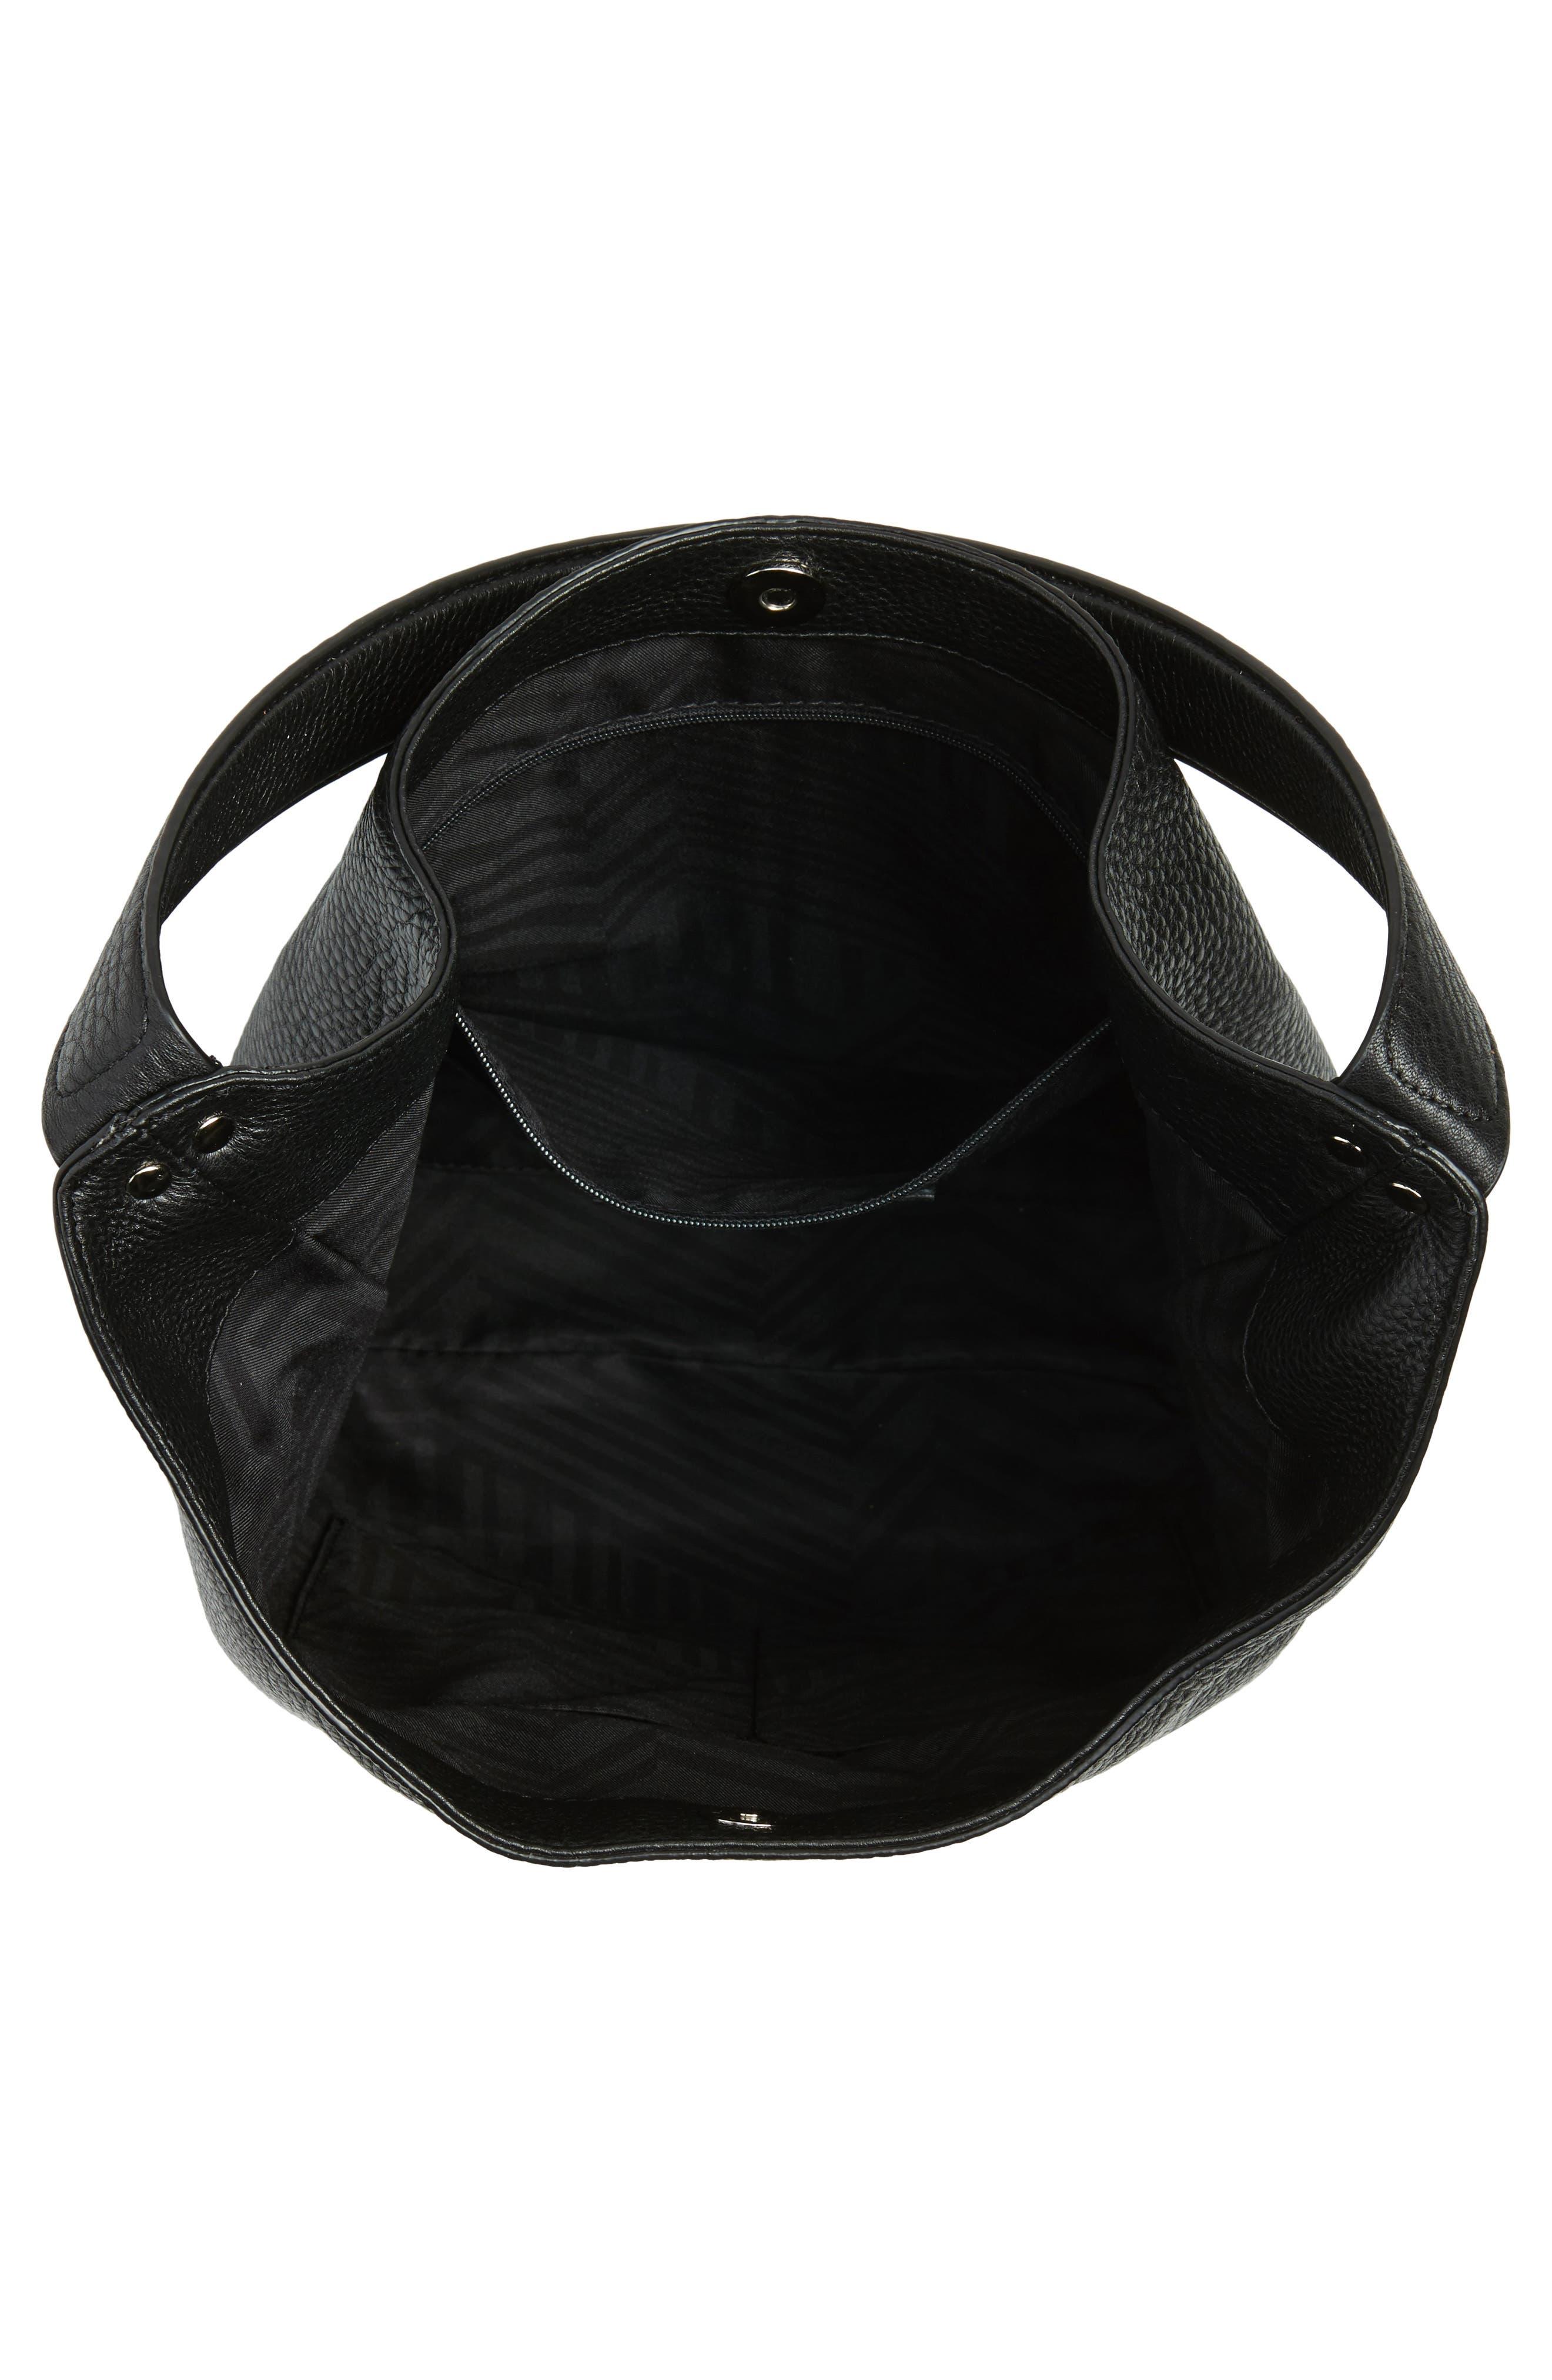 REBECCA MINKOFF,                             Medium Bryn Leather Hobo,                             Alternate thumbnail 4, color,                             001